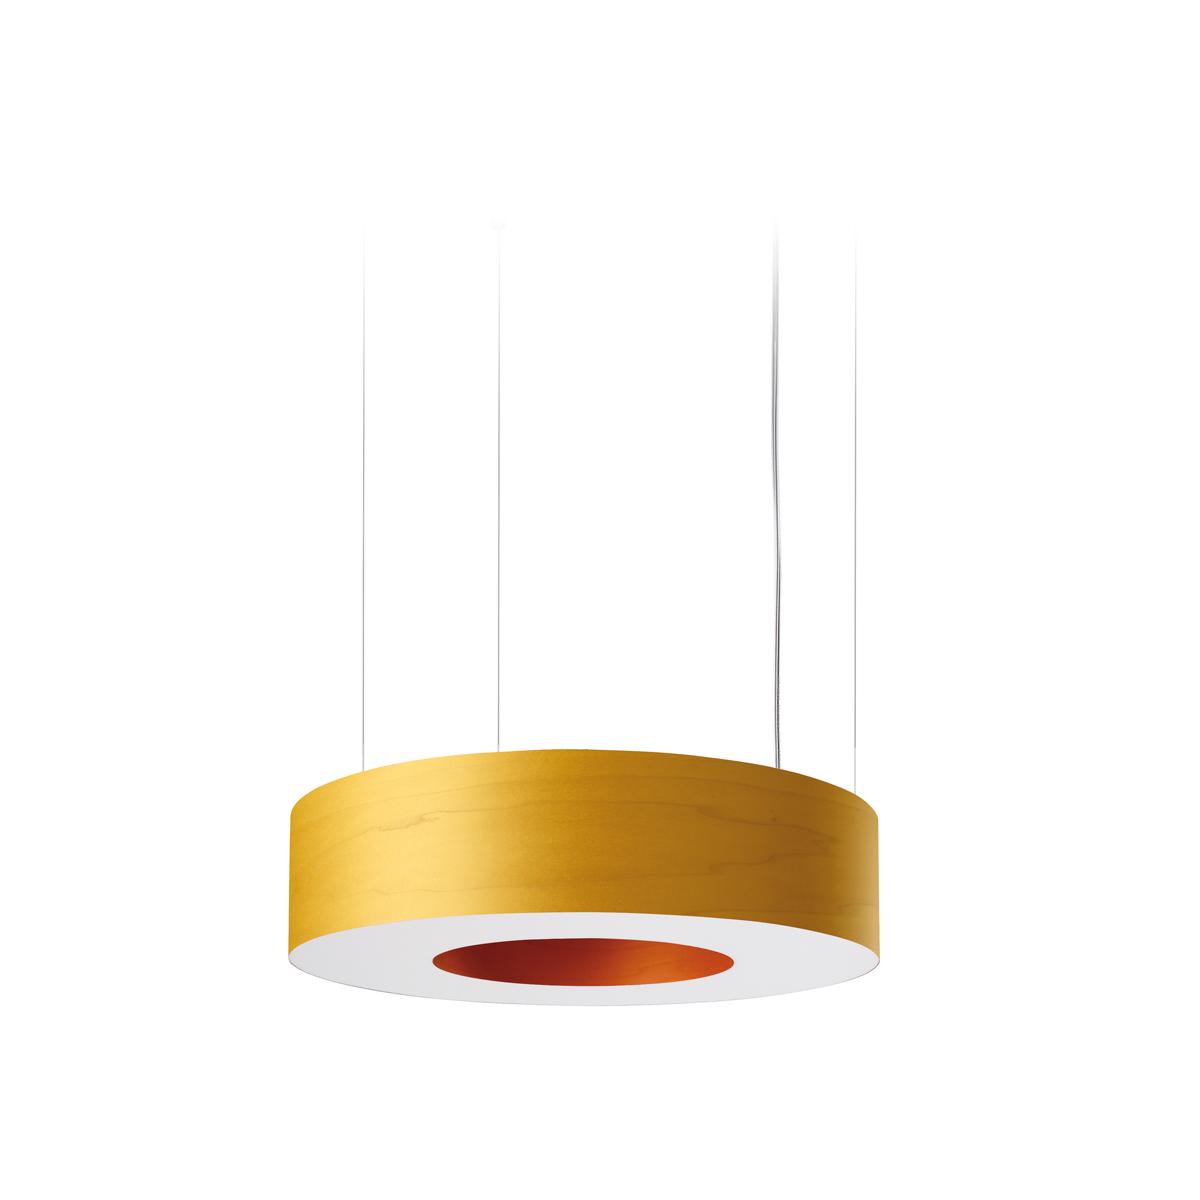 LZF Lamps Saturnia Small LED Pendelleuchte SAT SP LED DIM0-10V 24